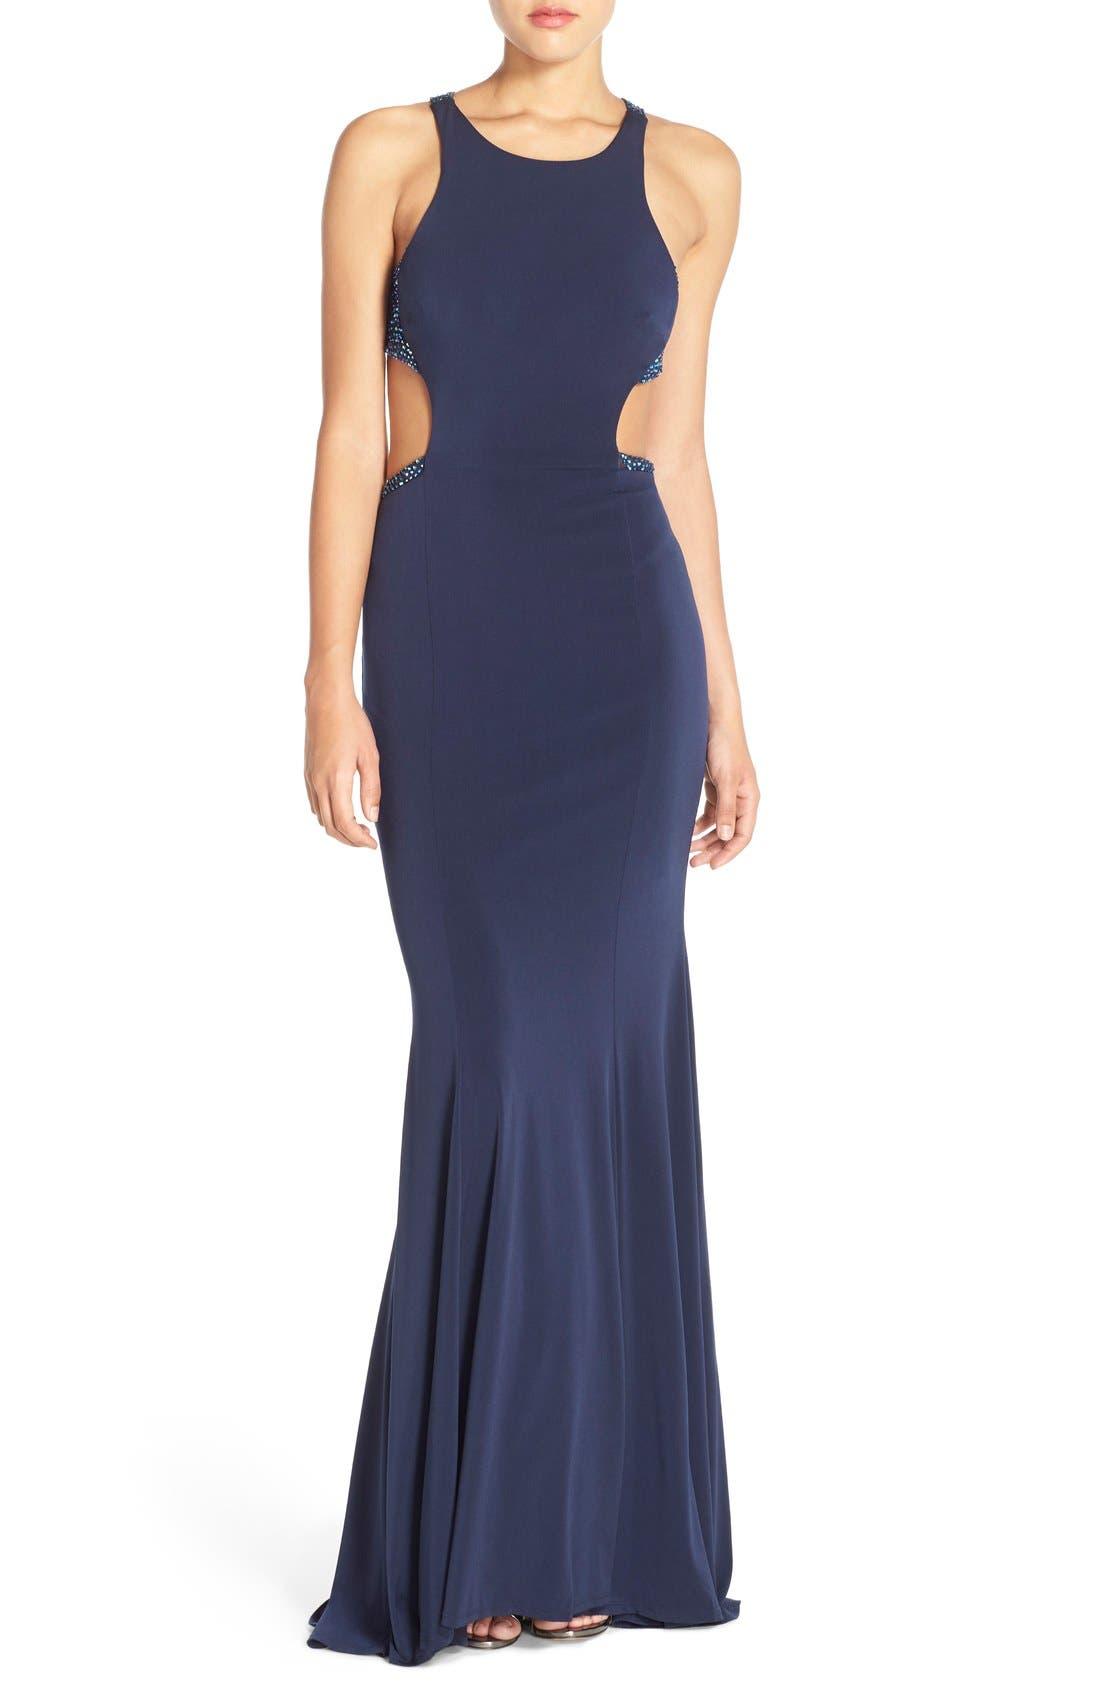 Main Image - La Femme Embellished Illusion Jersey Gown